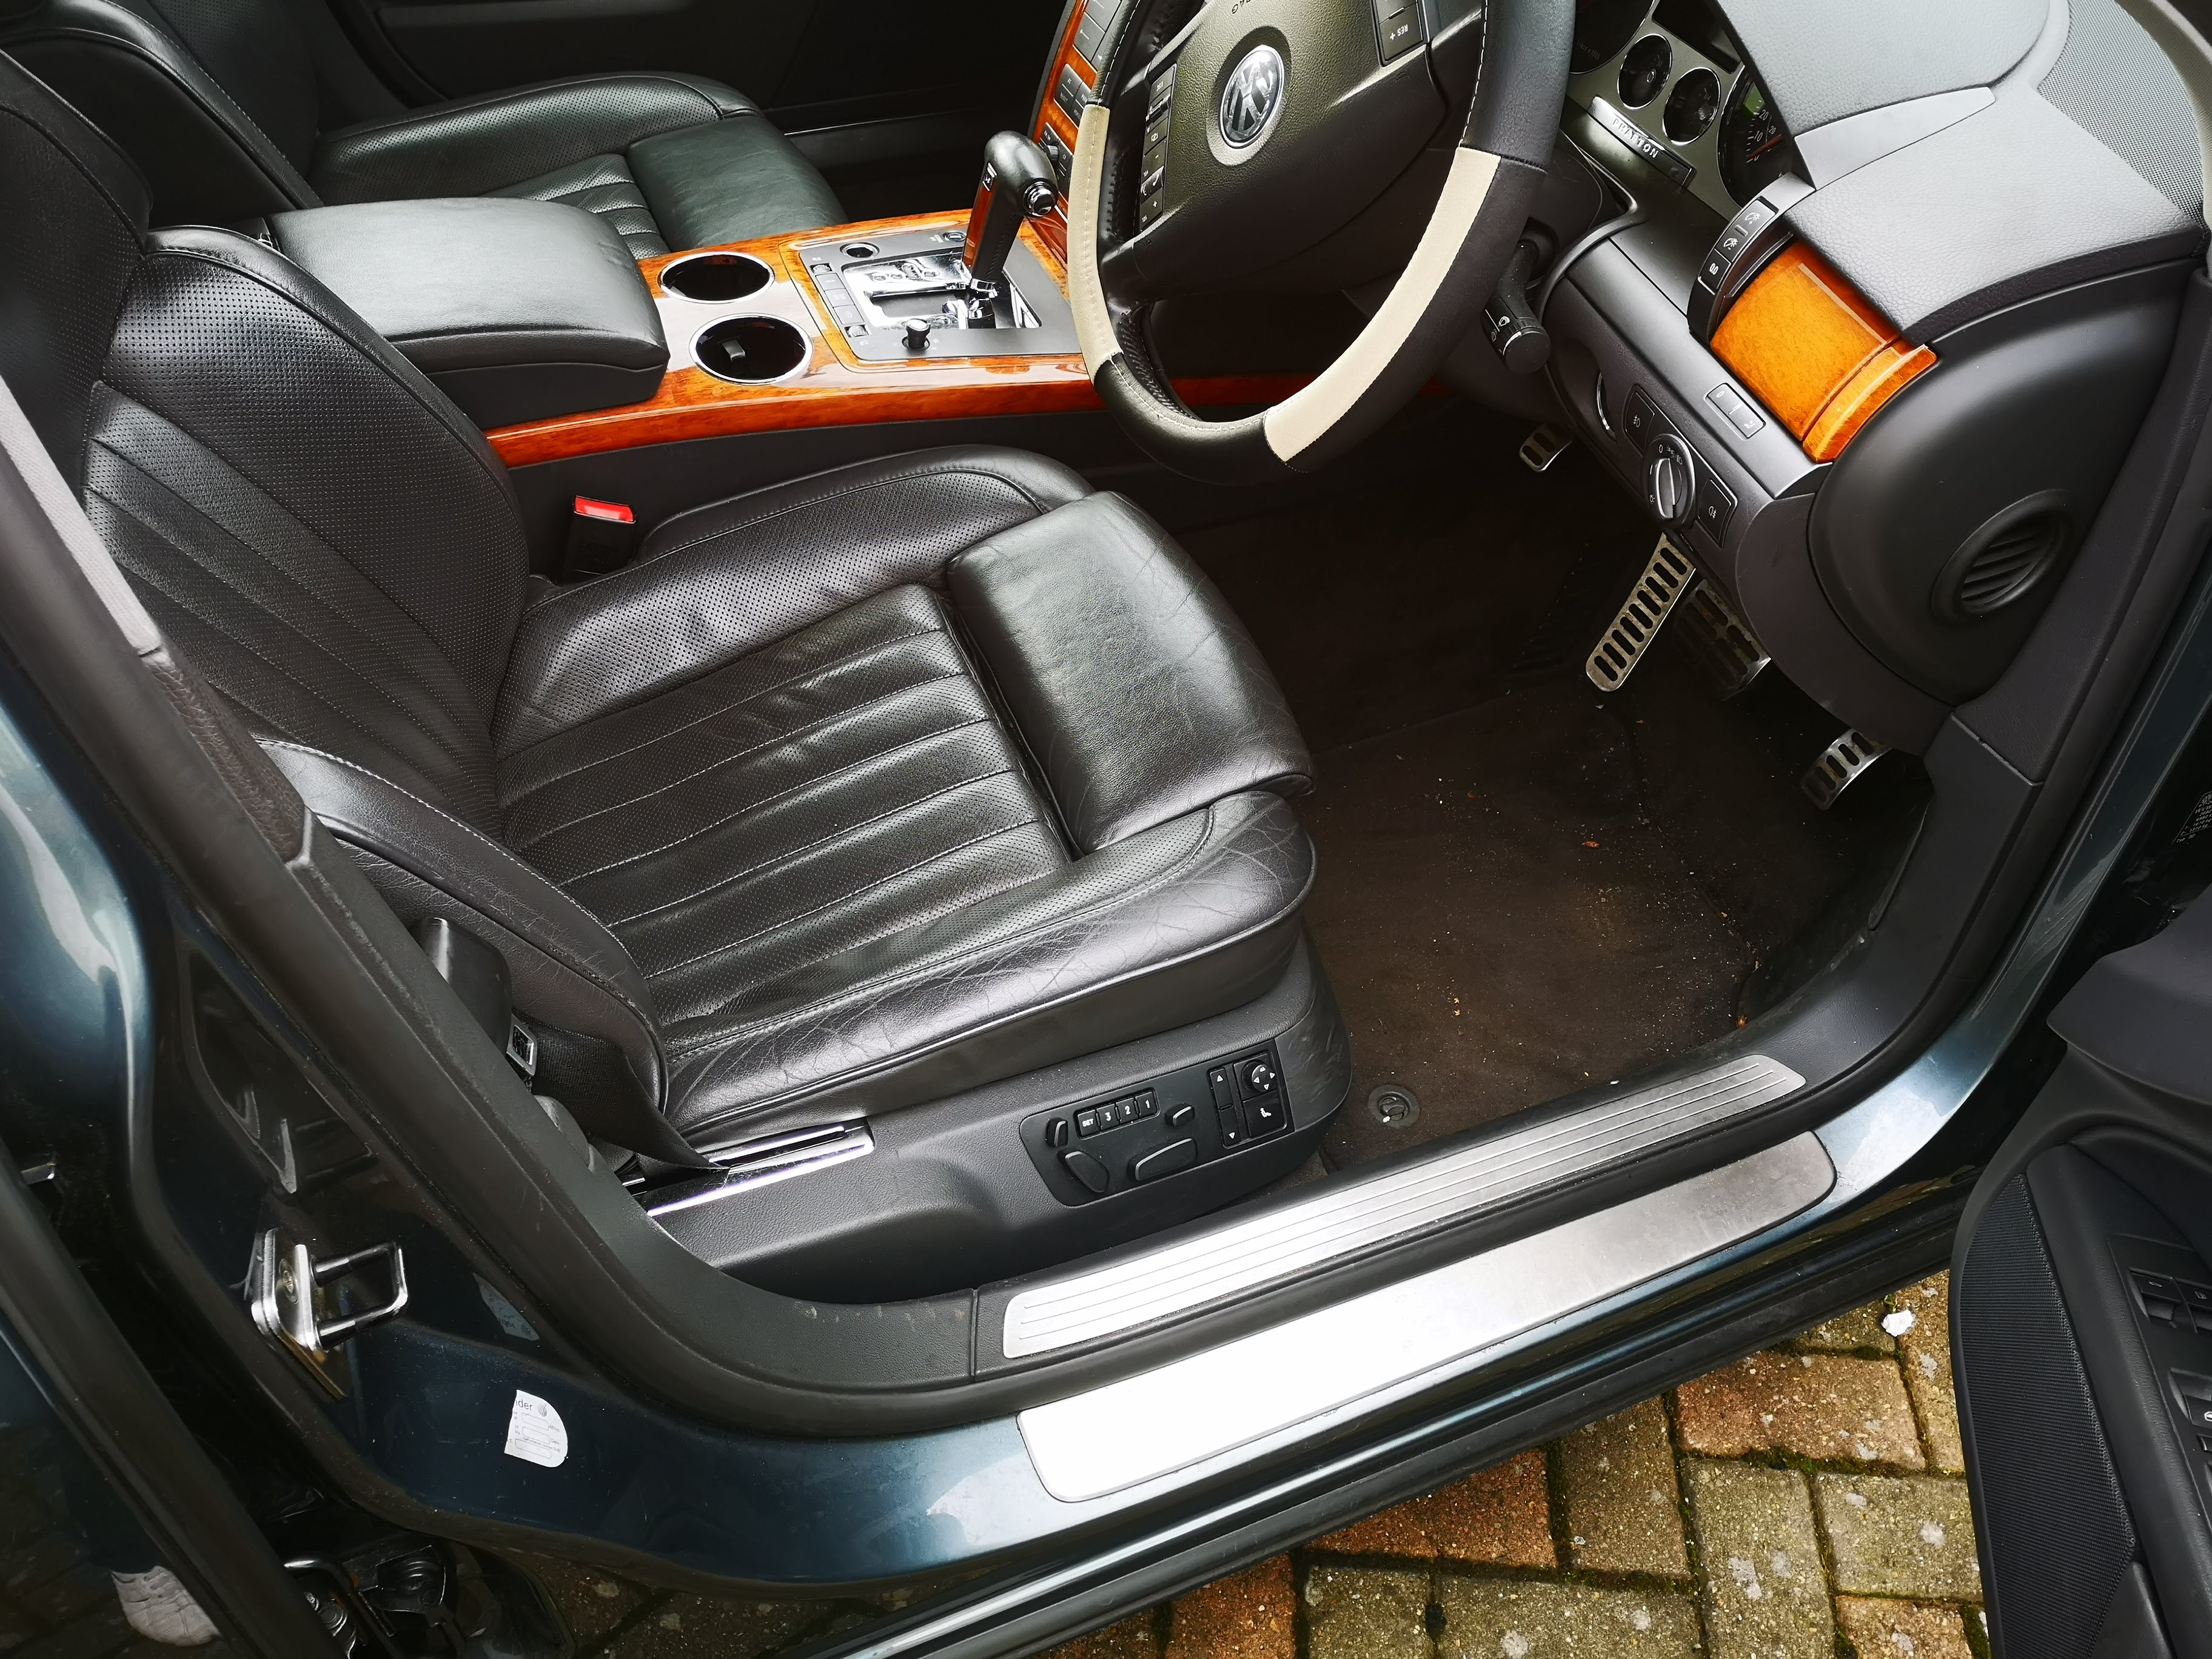 VW Phaeton 2004, 3,2l petrol, 123000mile